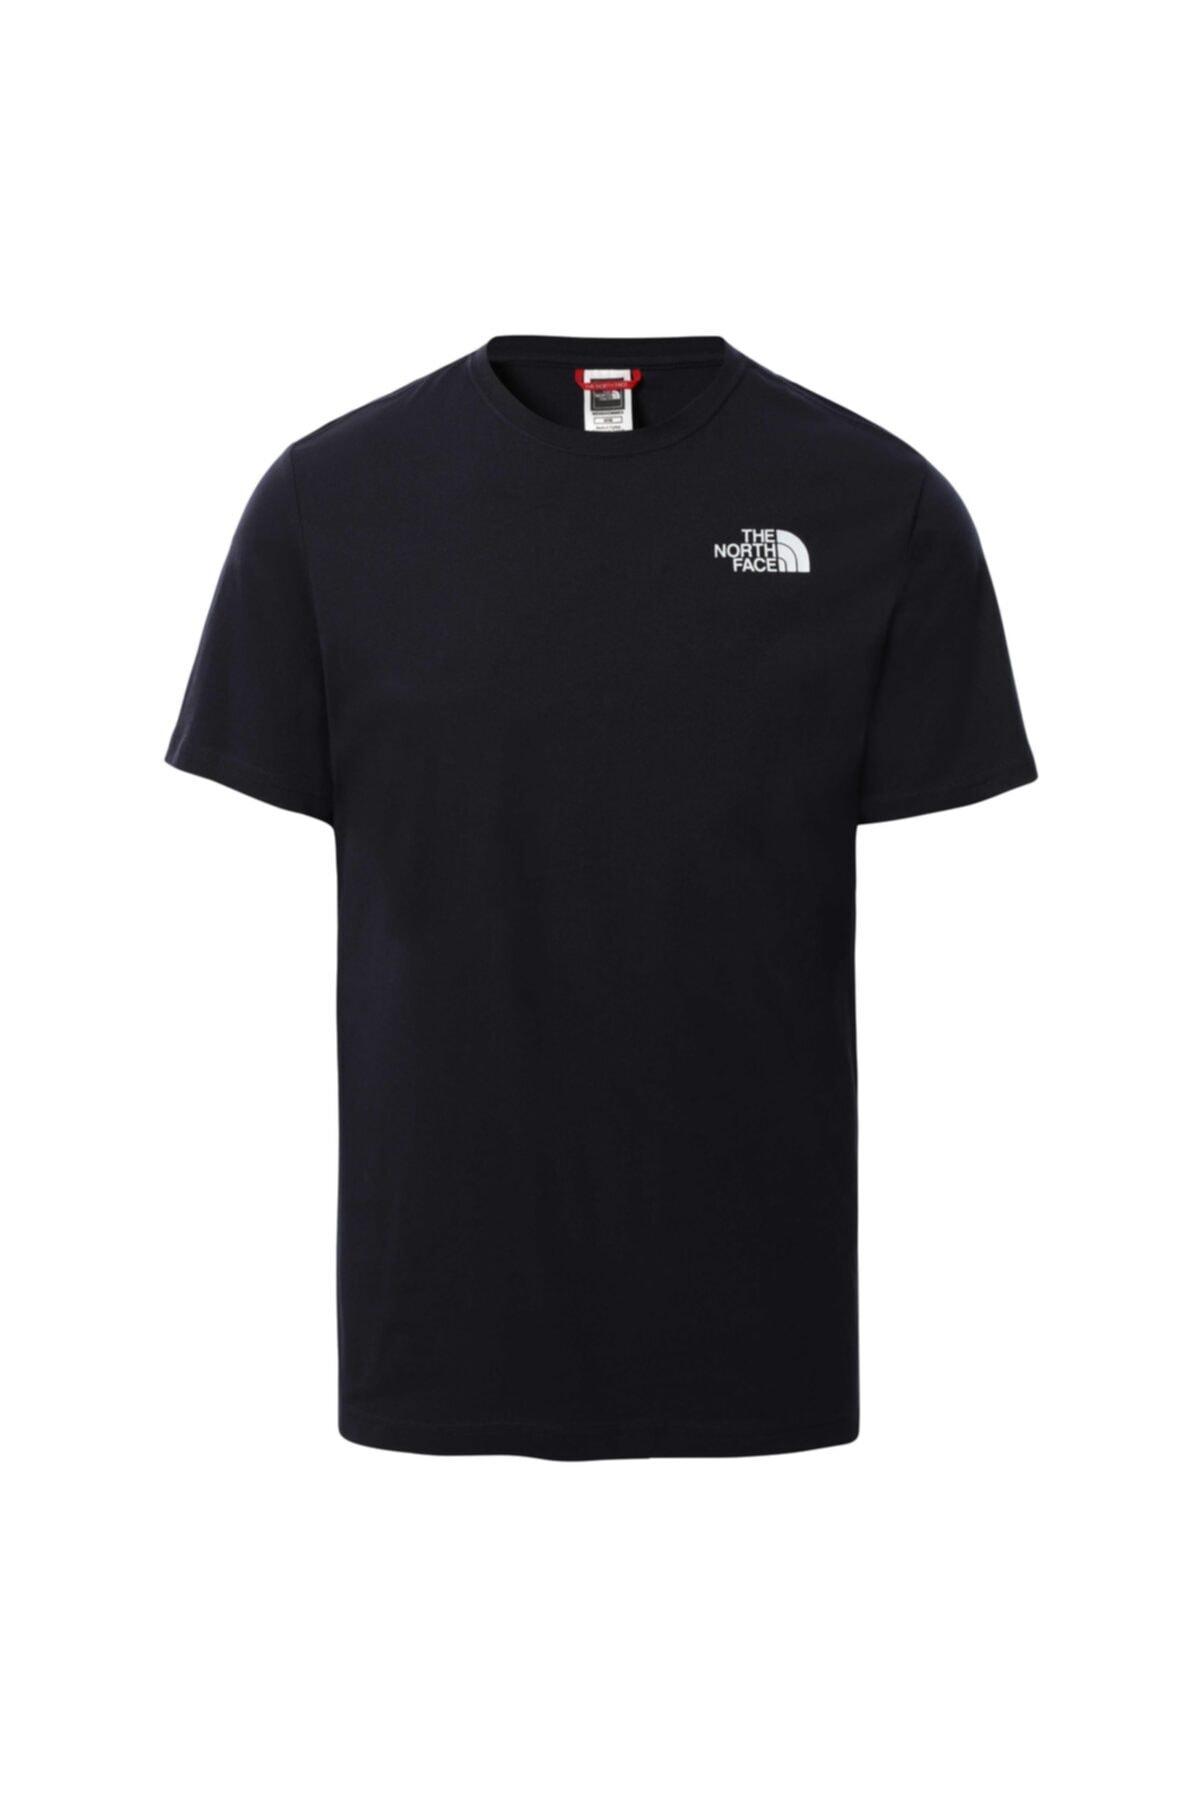 Erkek Redbox Tee T-shirt - T92tx20gz